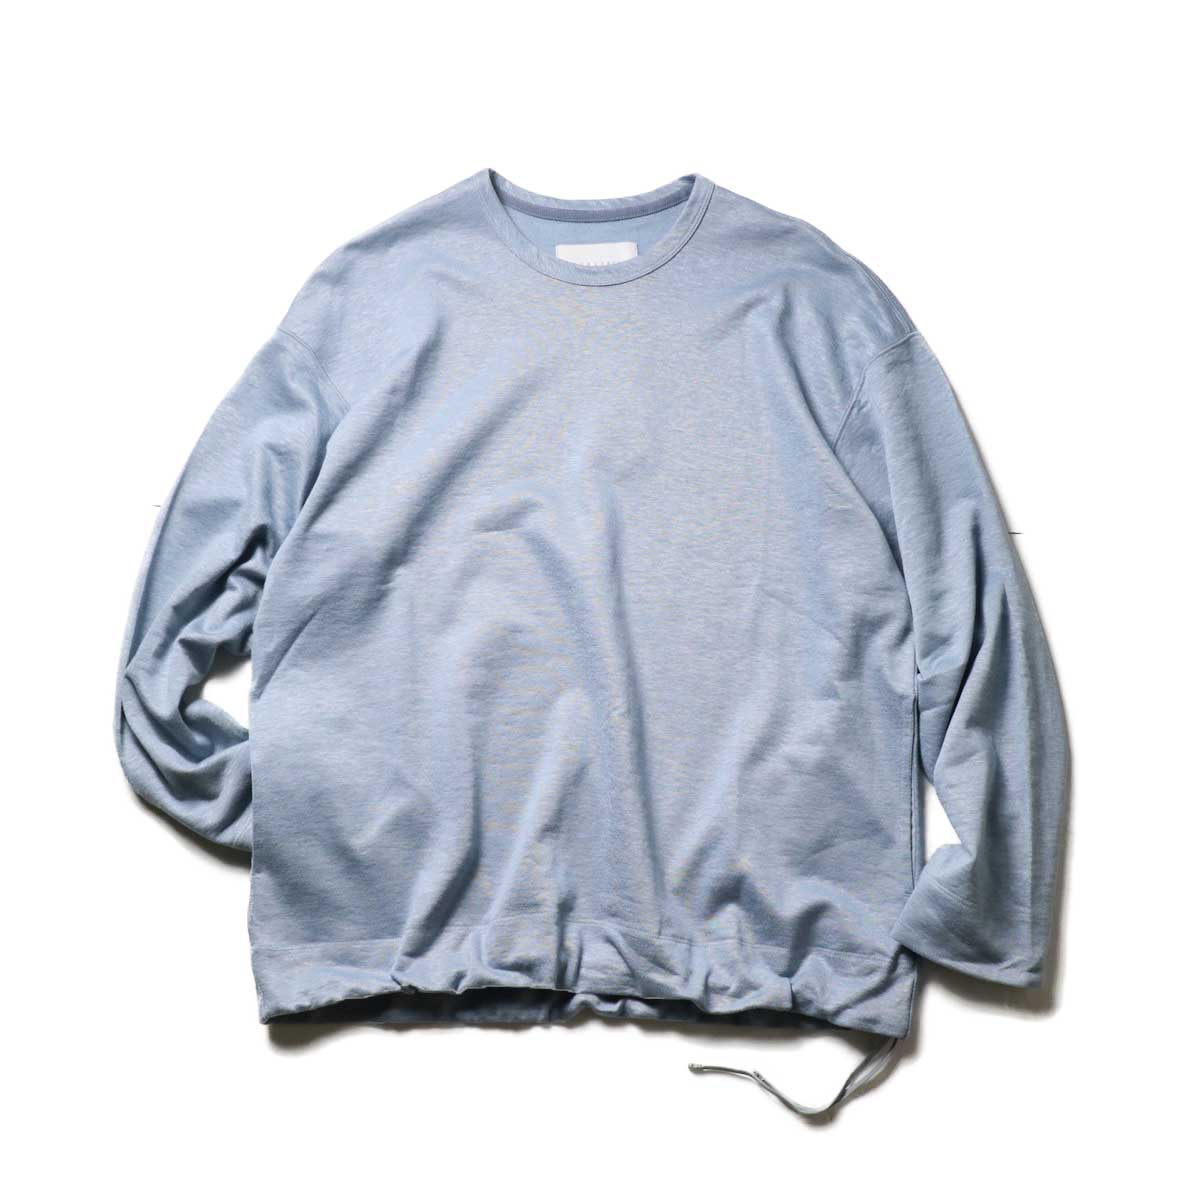 CURLY / CLOUDY CREW SWEAT (Steel Blue)